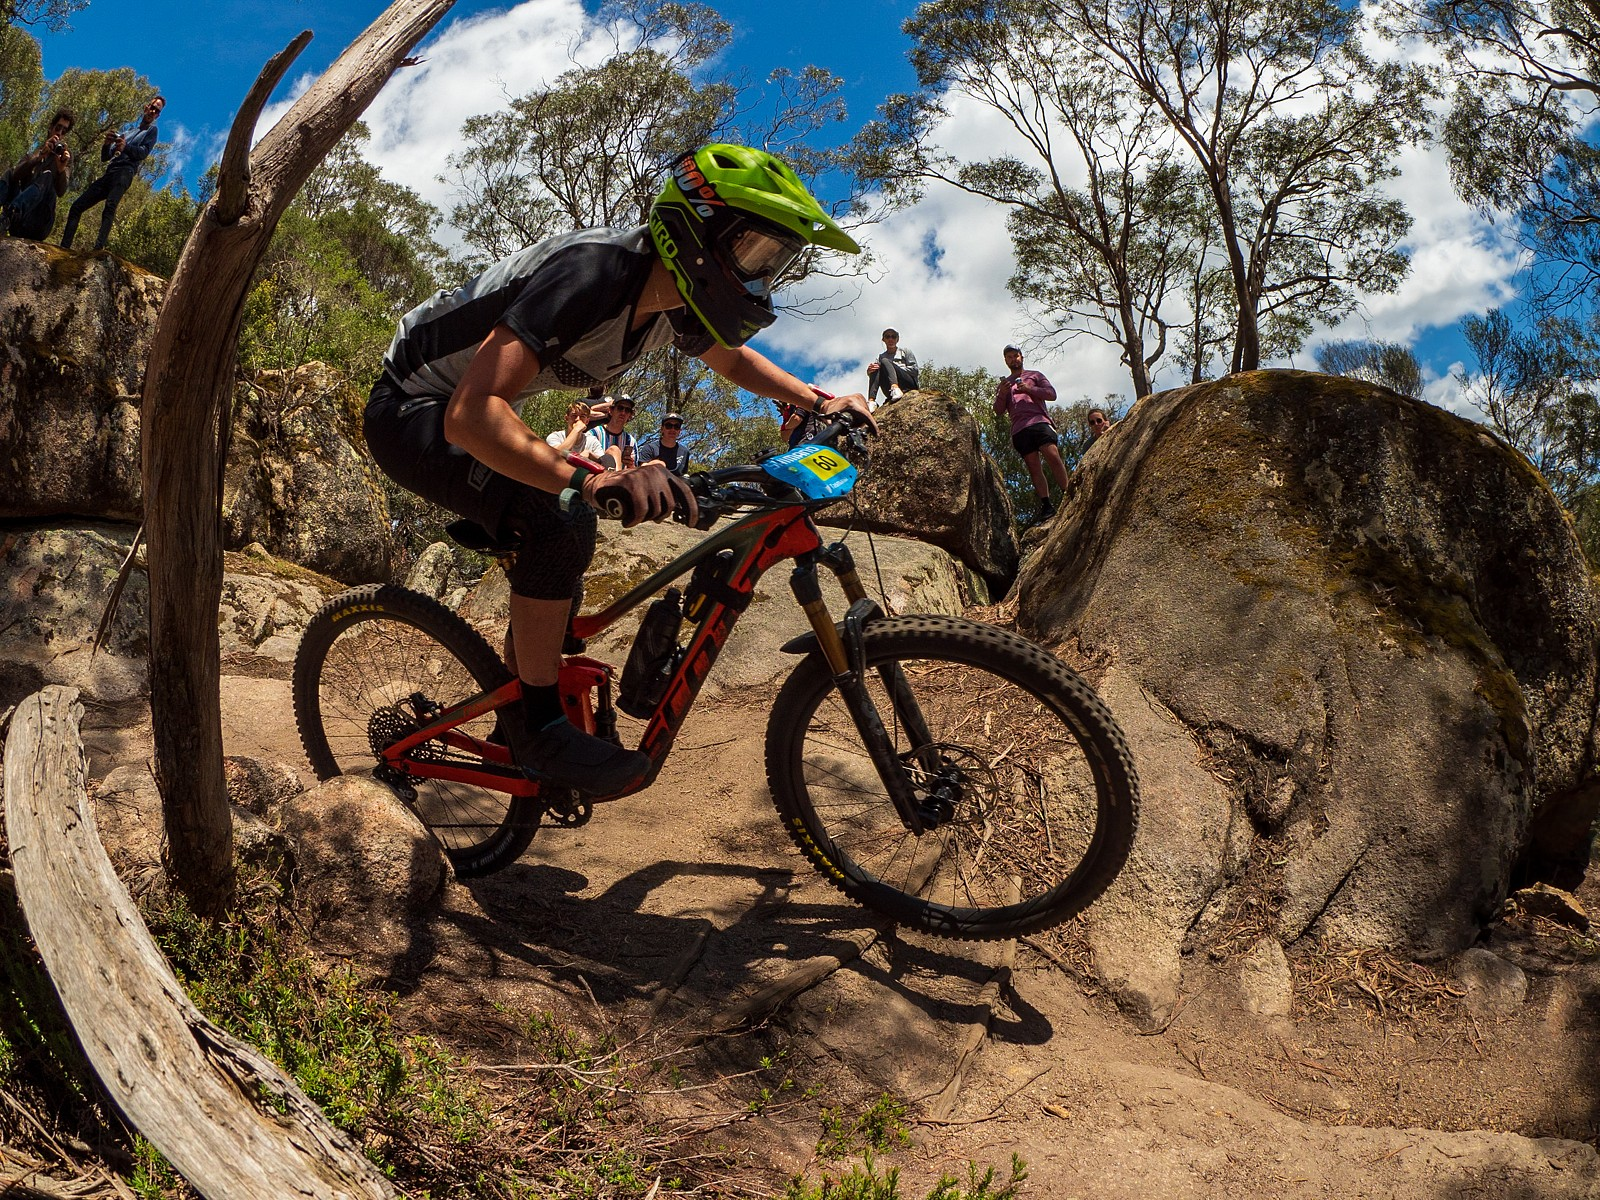 171119-Tassie-0186 - jack.fletcher86 - Mountain Biking Pictures - Vital MTB